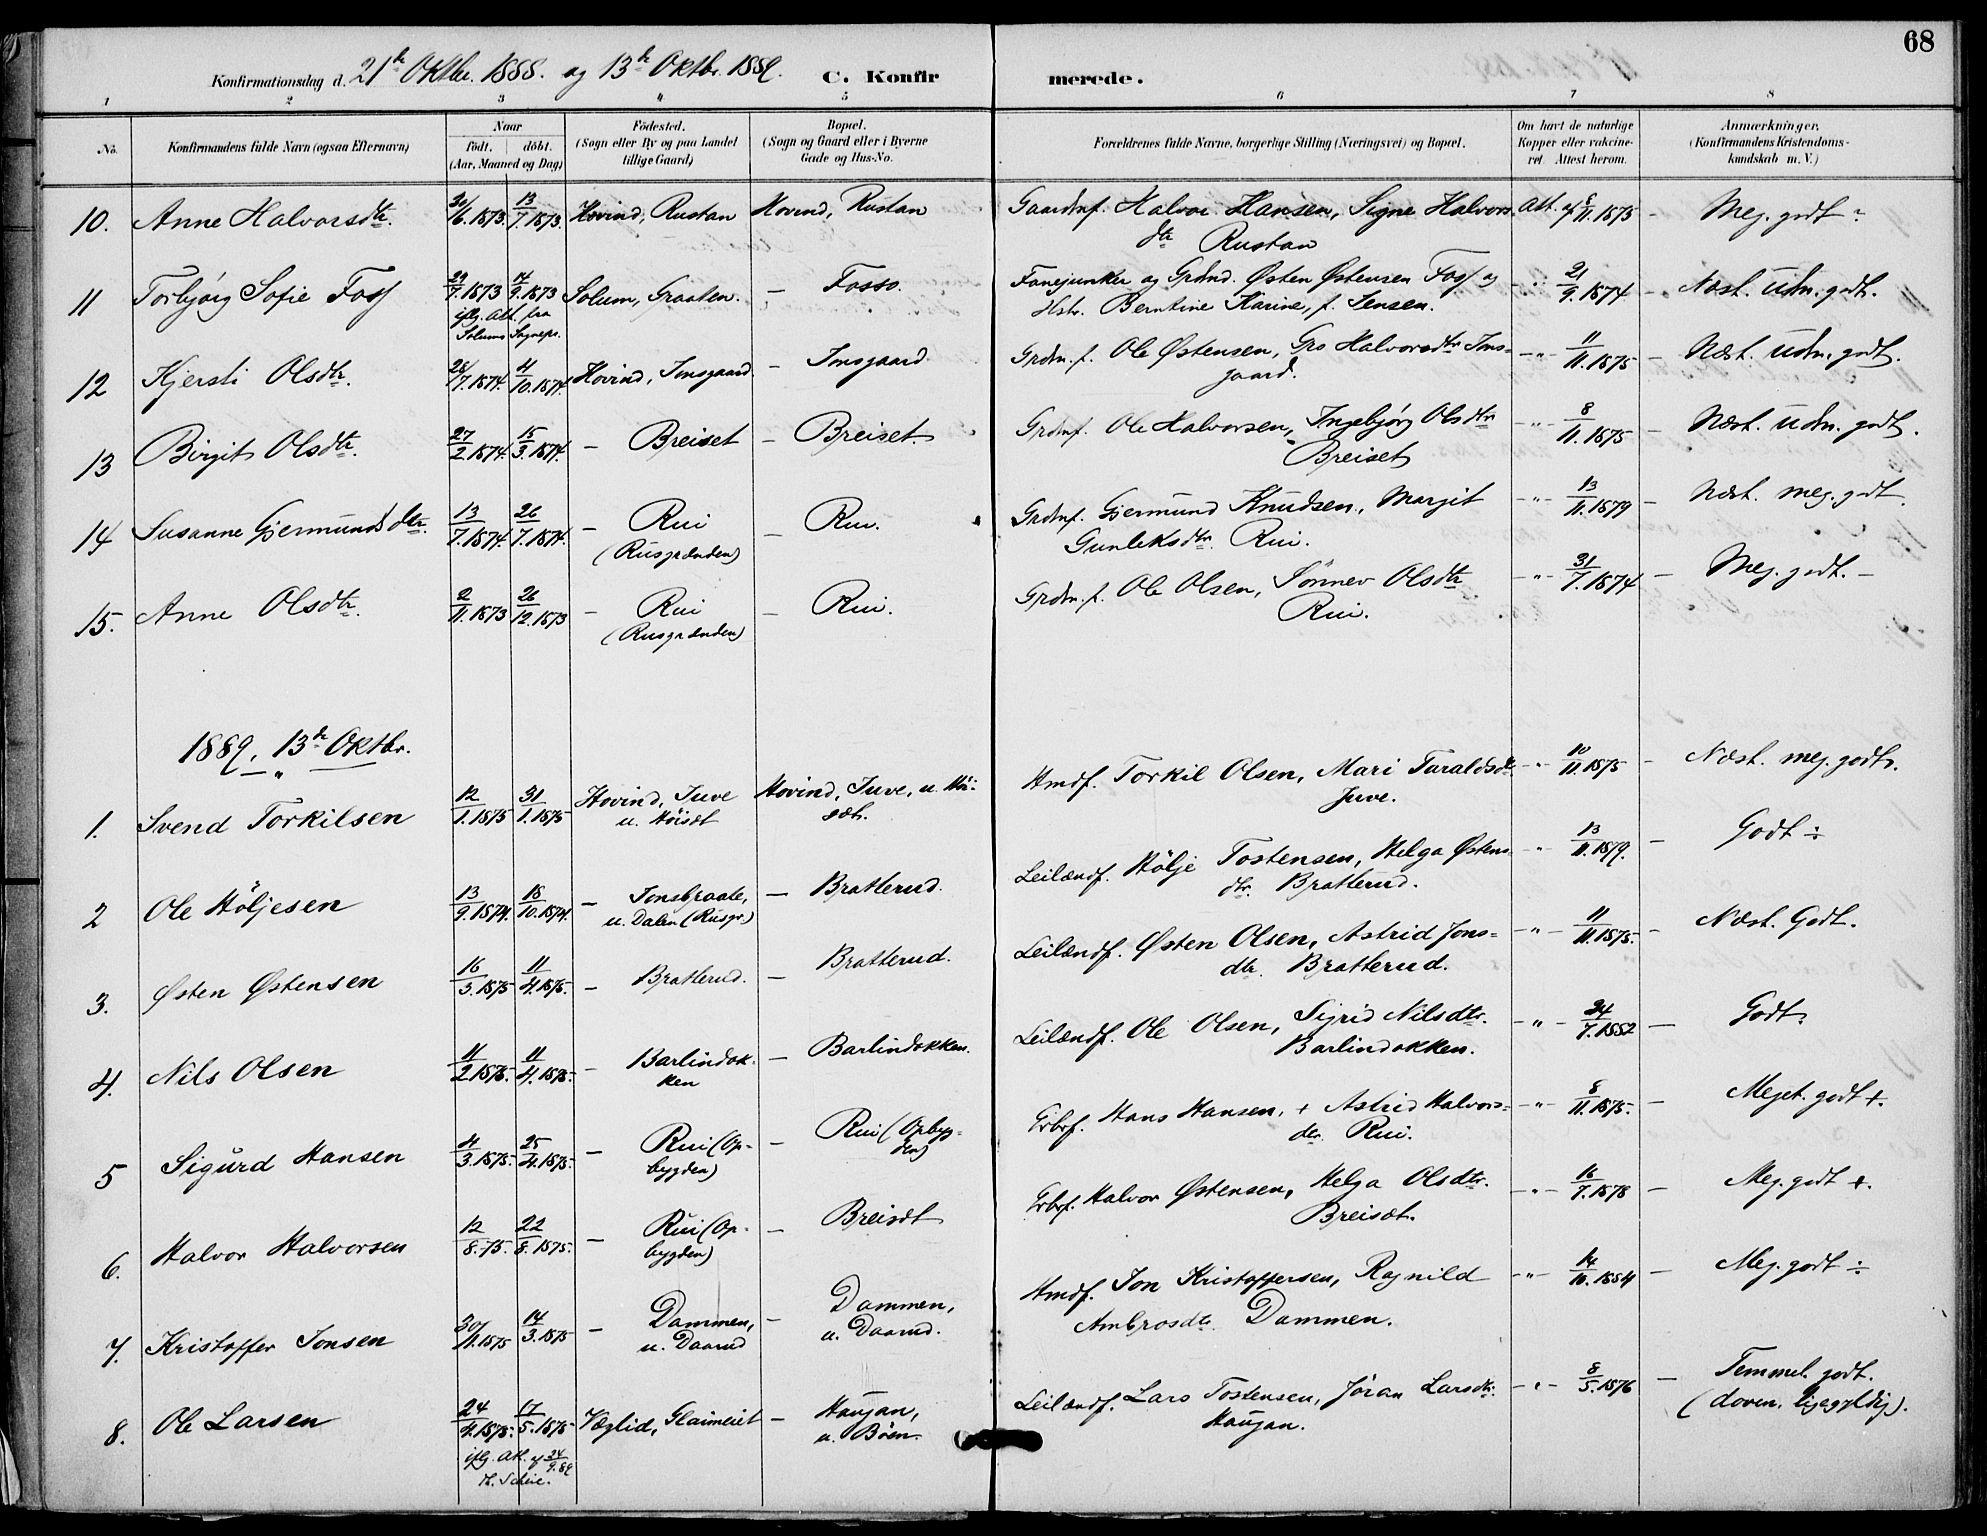 SAKO, Gransherad kirkebøker, F/Fb/L0005: Ministerialbok nr. II 5, 1887-1916, s. 68